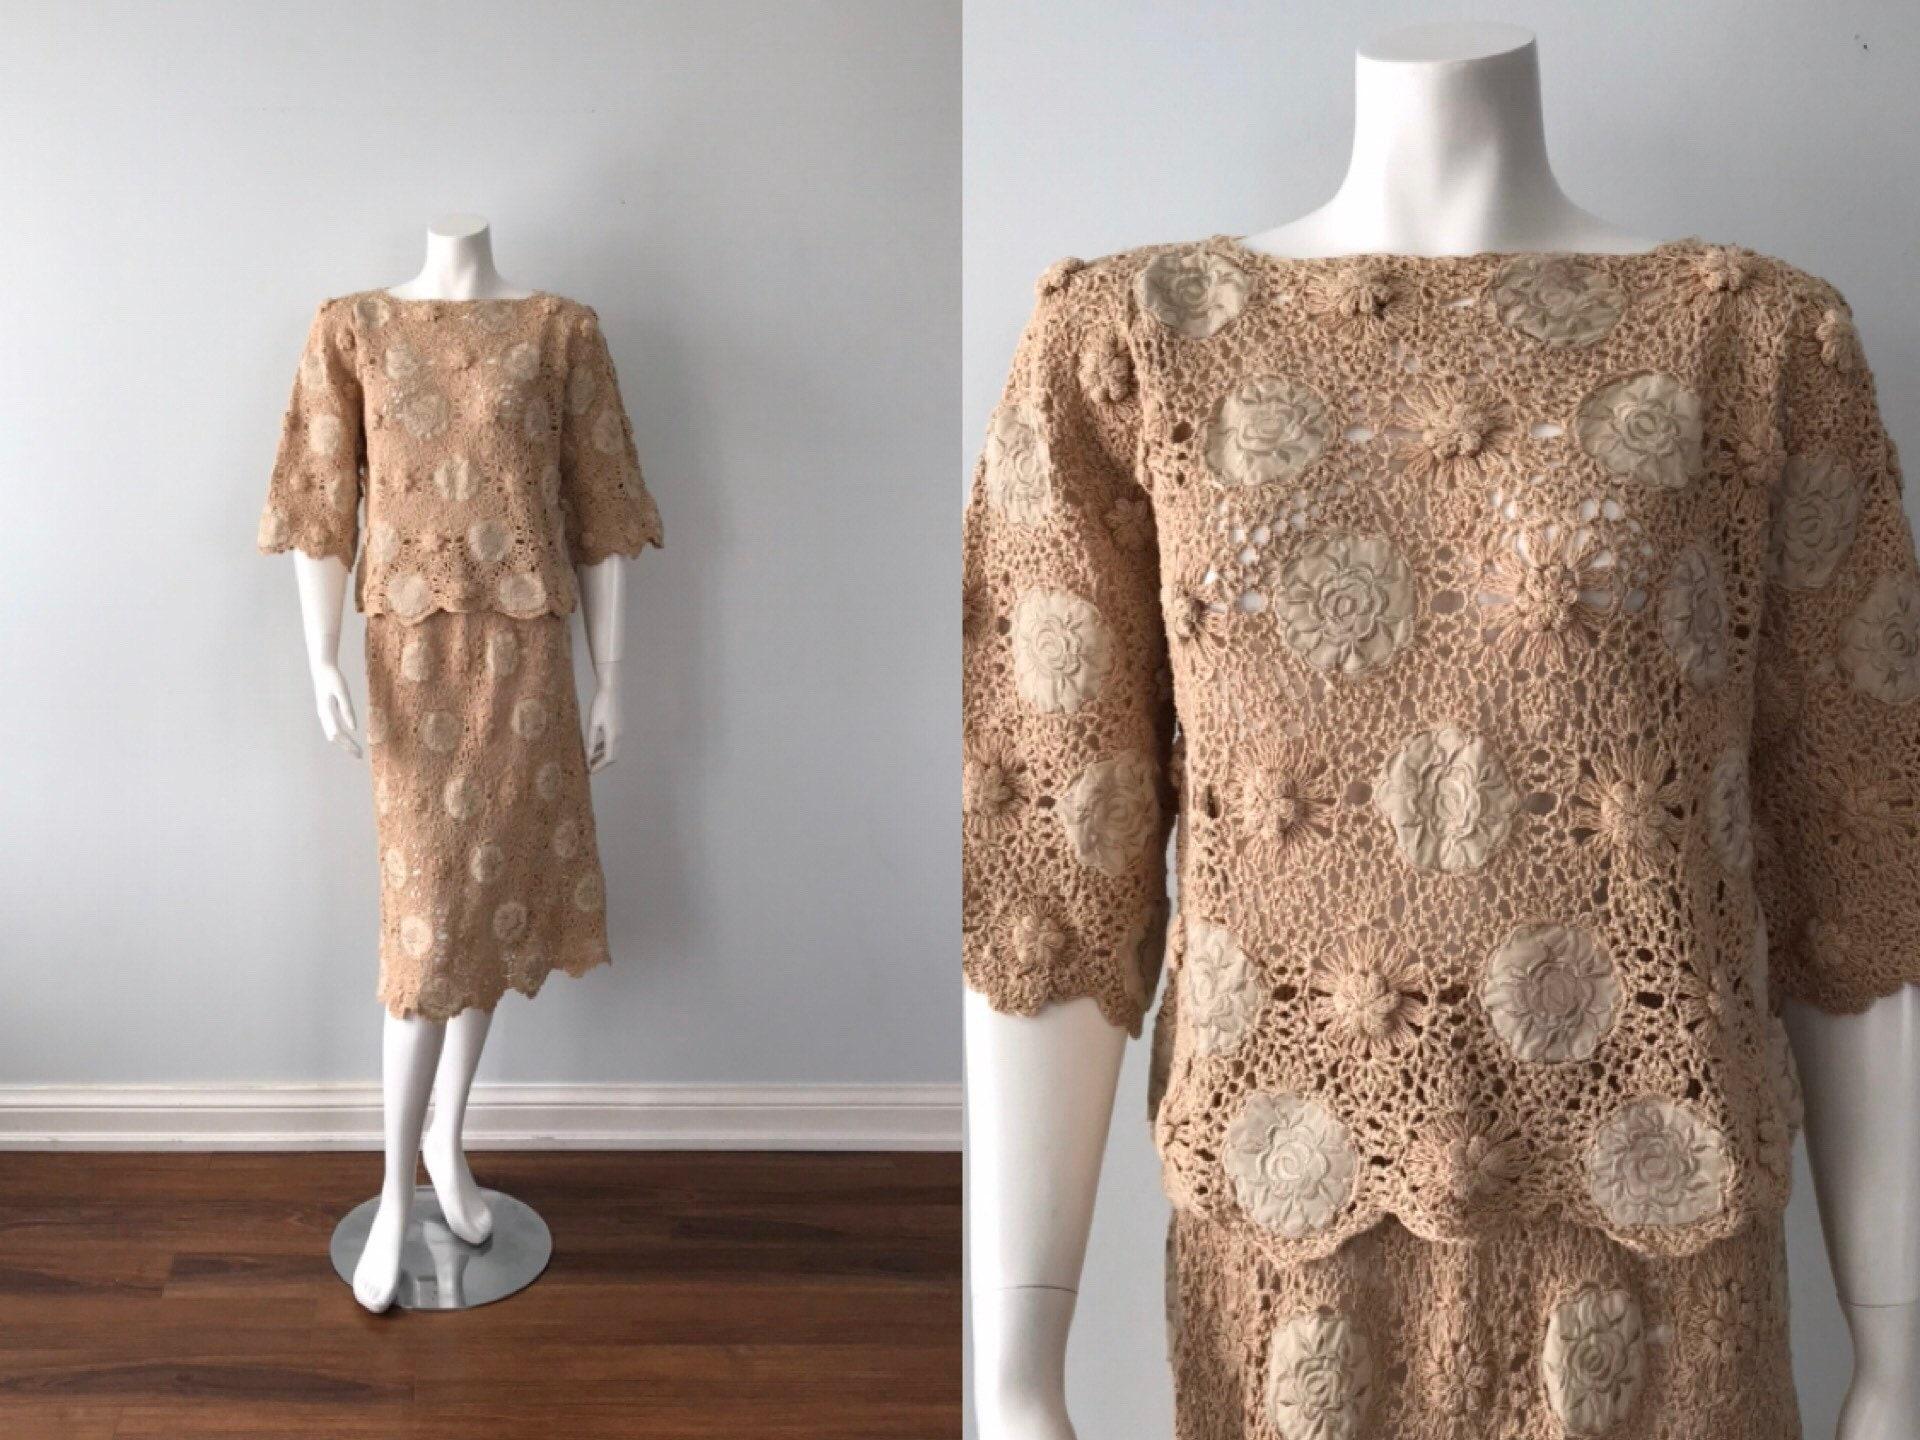 80s Sweatshirts, Sweaters, Vests | Women 1980S Crochet Skirt  Top, Kyoyko, Hand Set, Sweater Set $135.00 AT vintagedancer.com